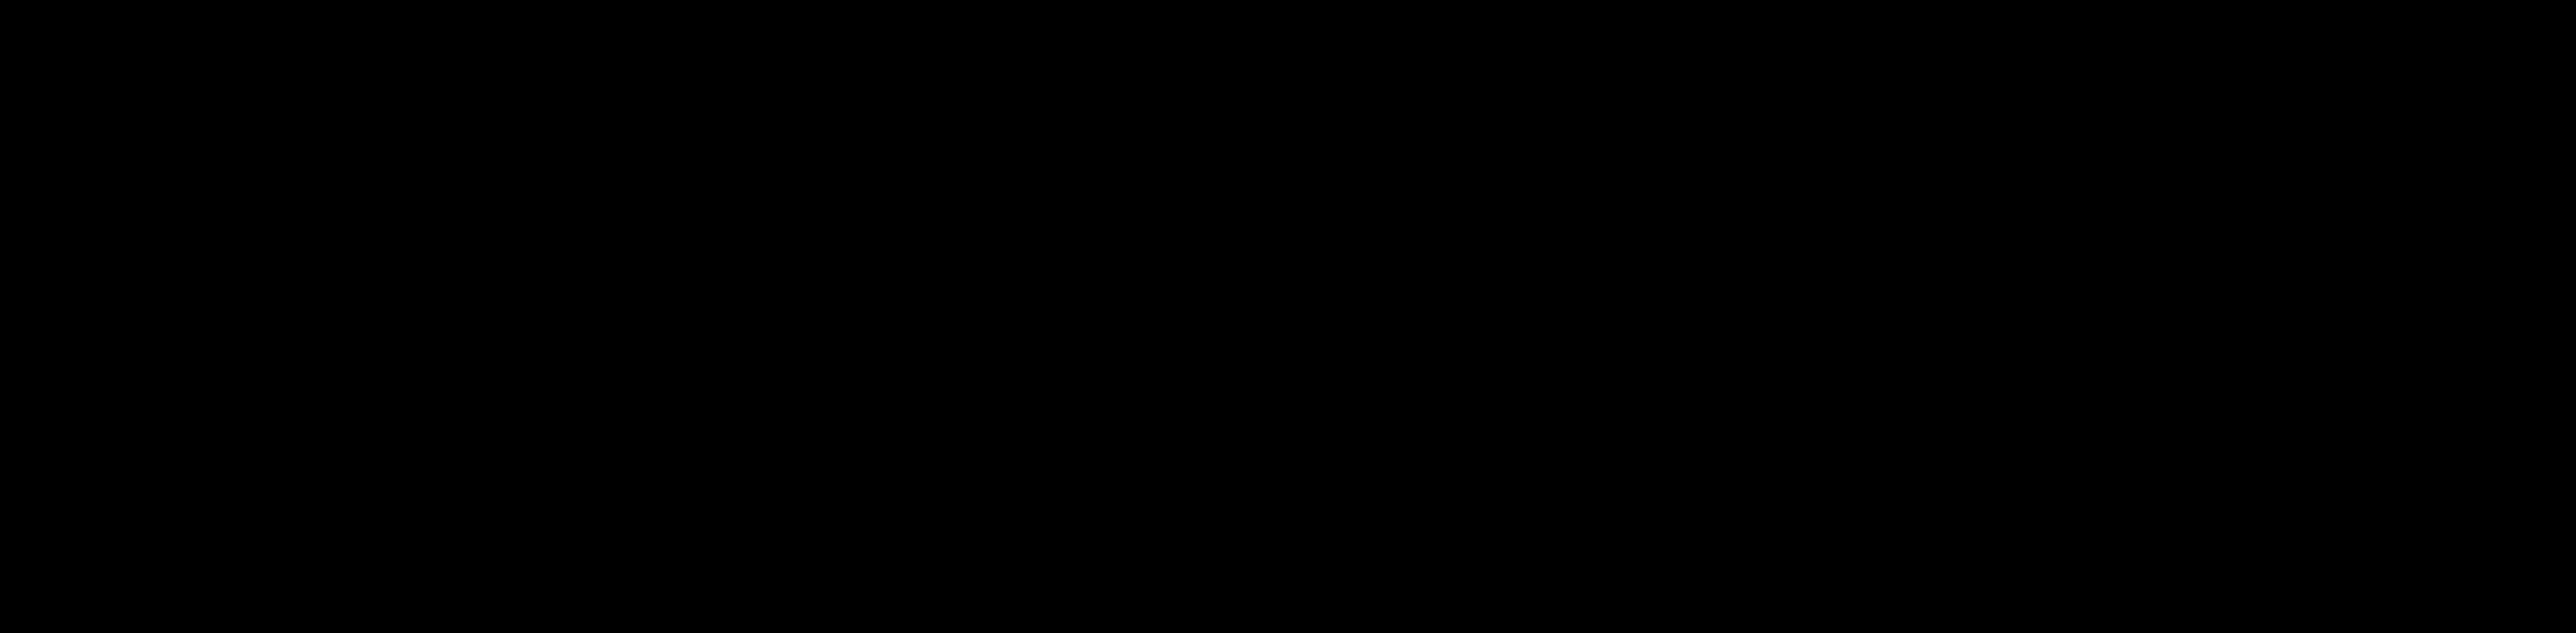 johnnie walker logos download rh logos download com johnnie walker logo history